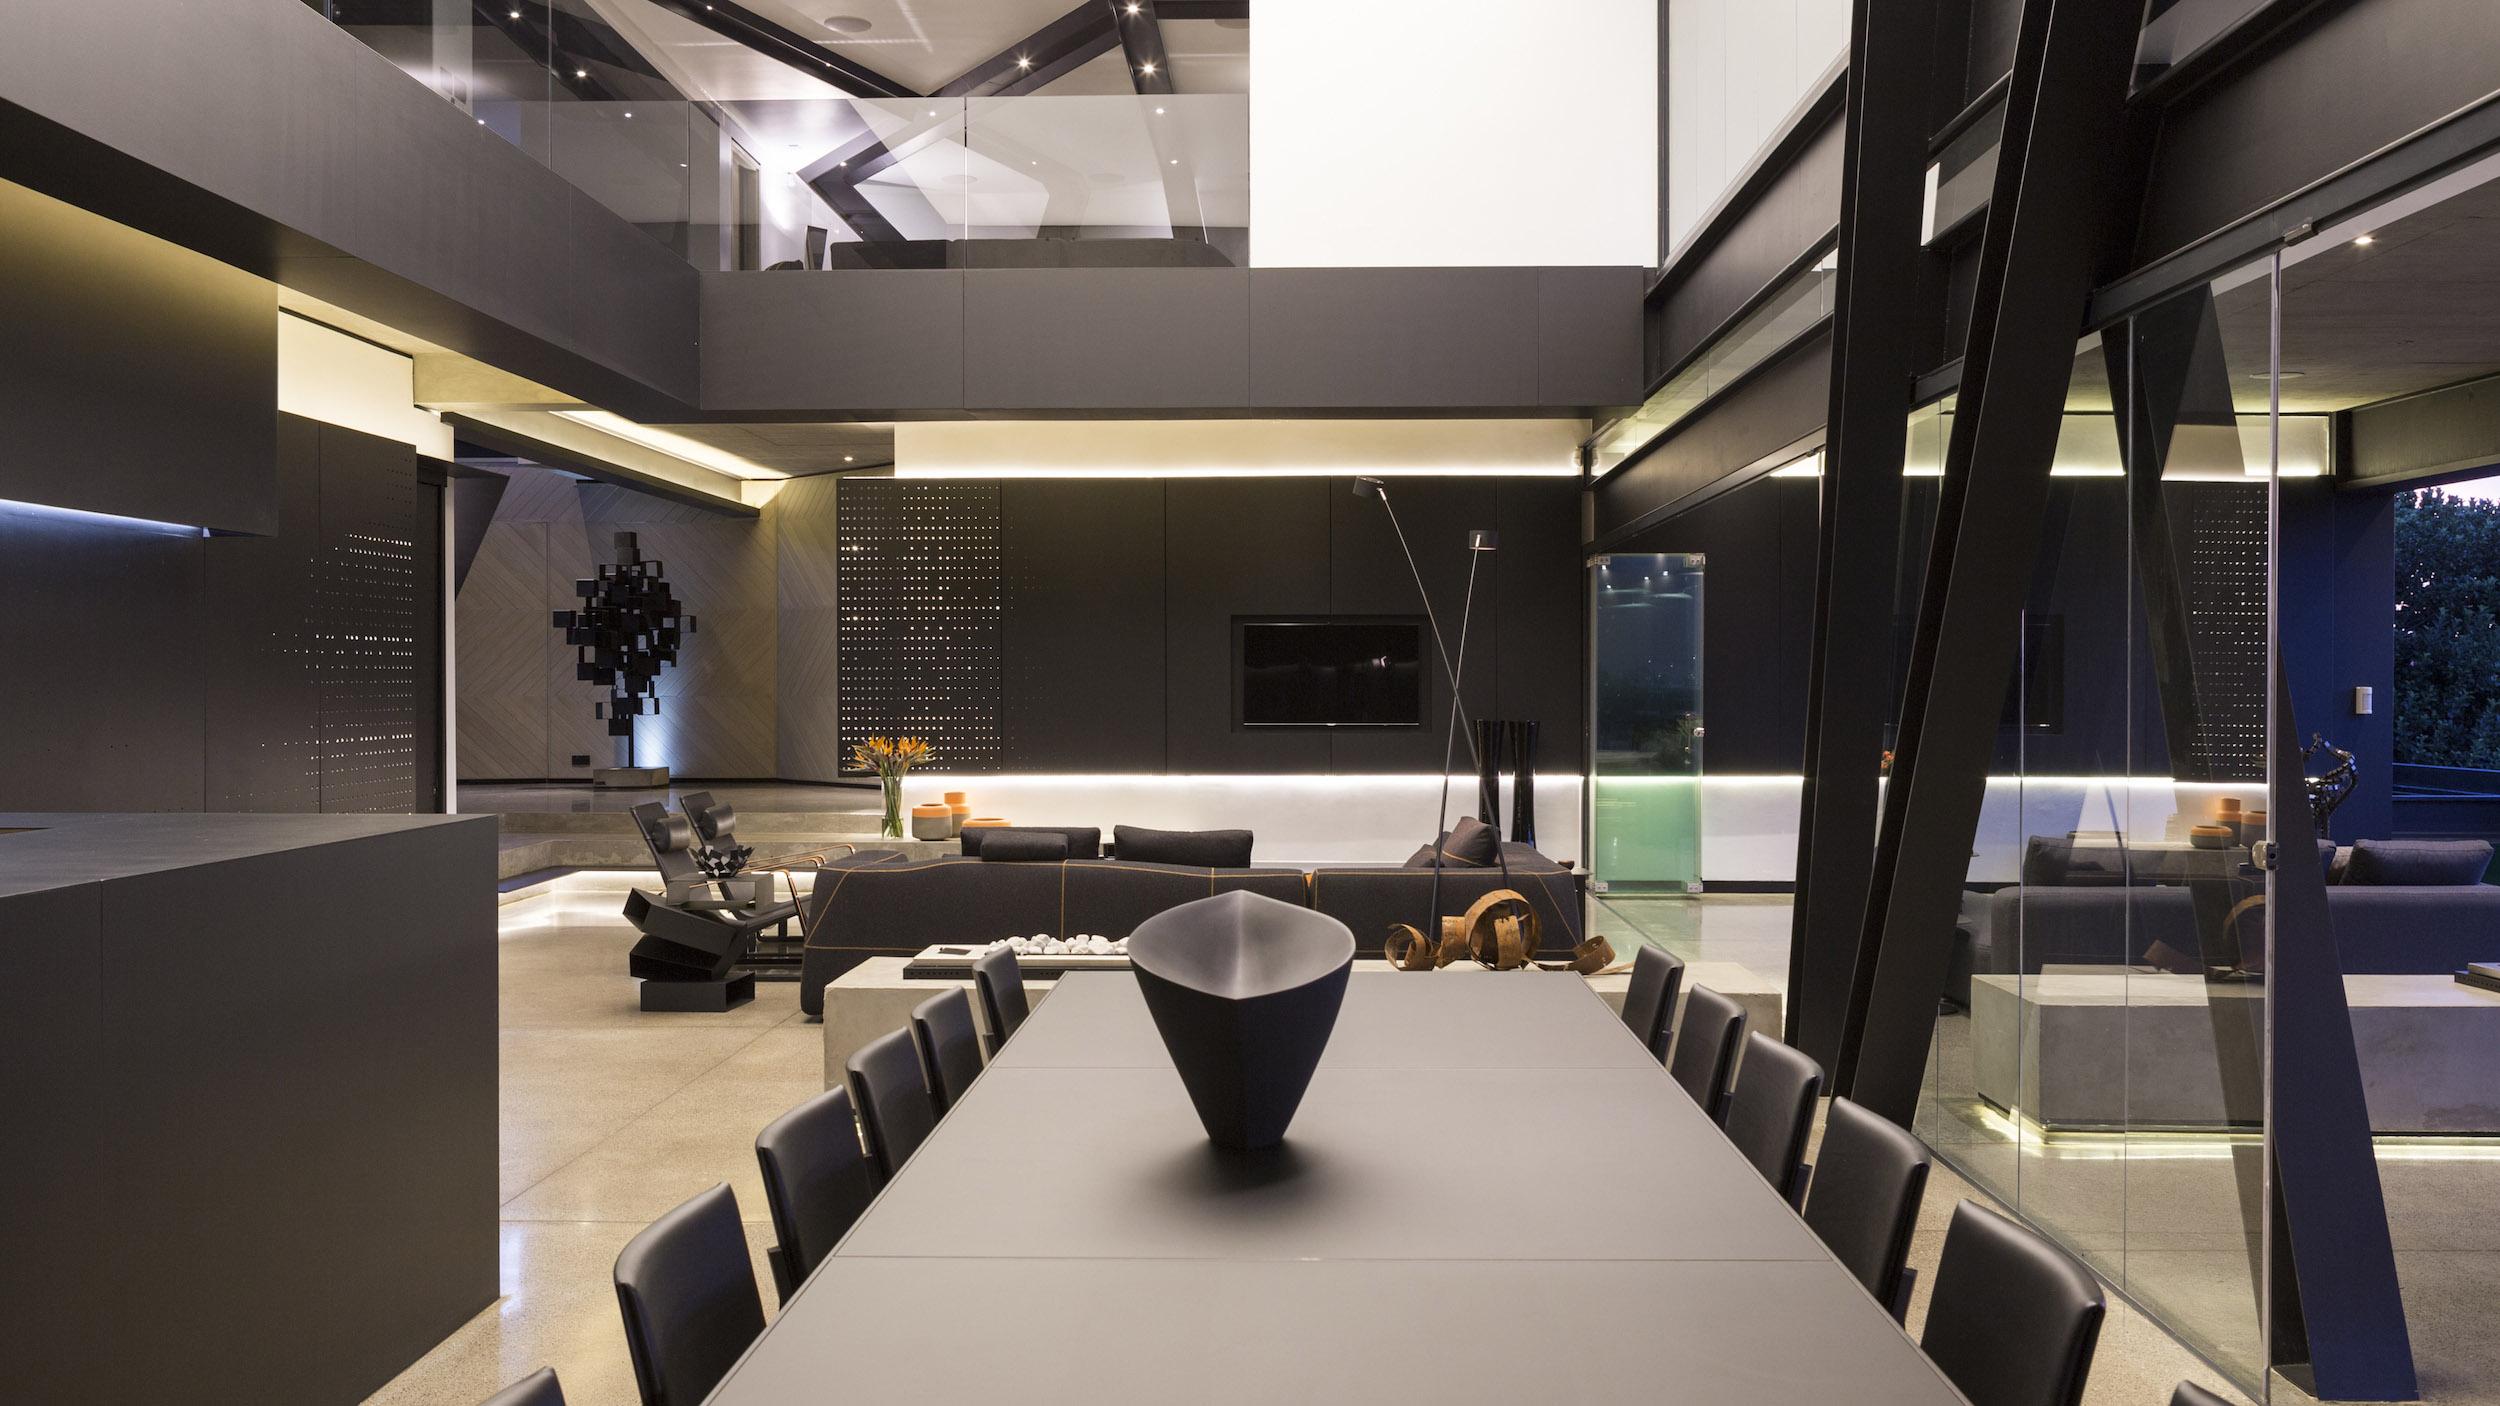 Kloof Road Masterpiece House in Johannesburg by Nico van der Meulen Architects-21